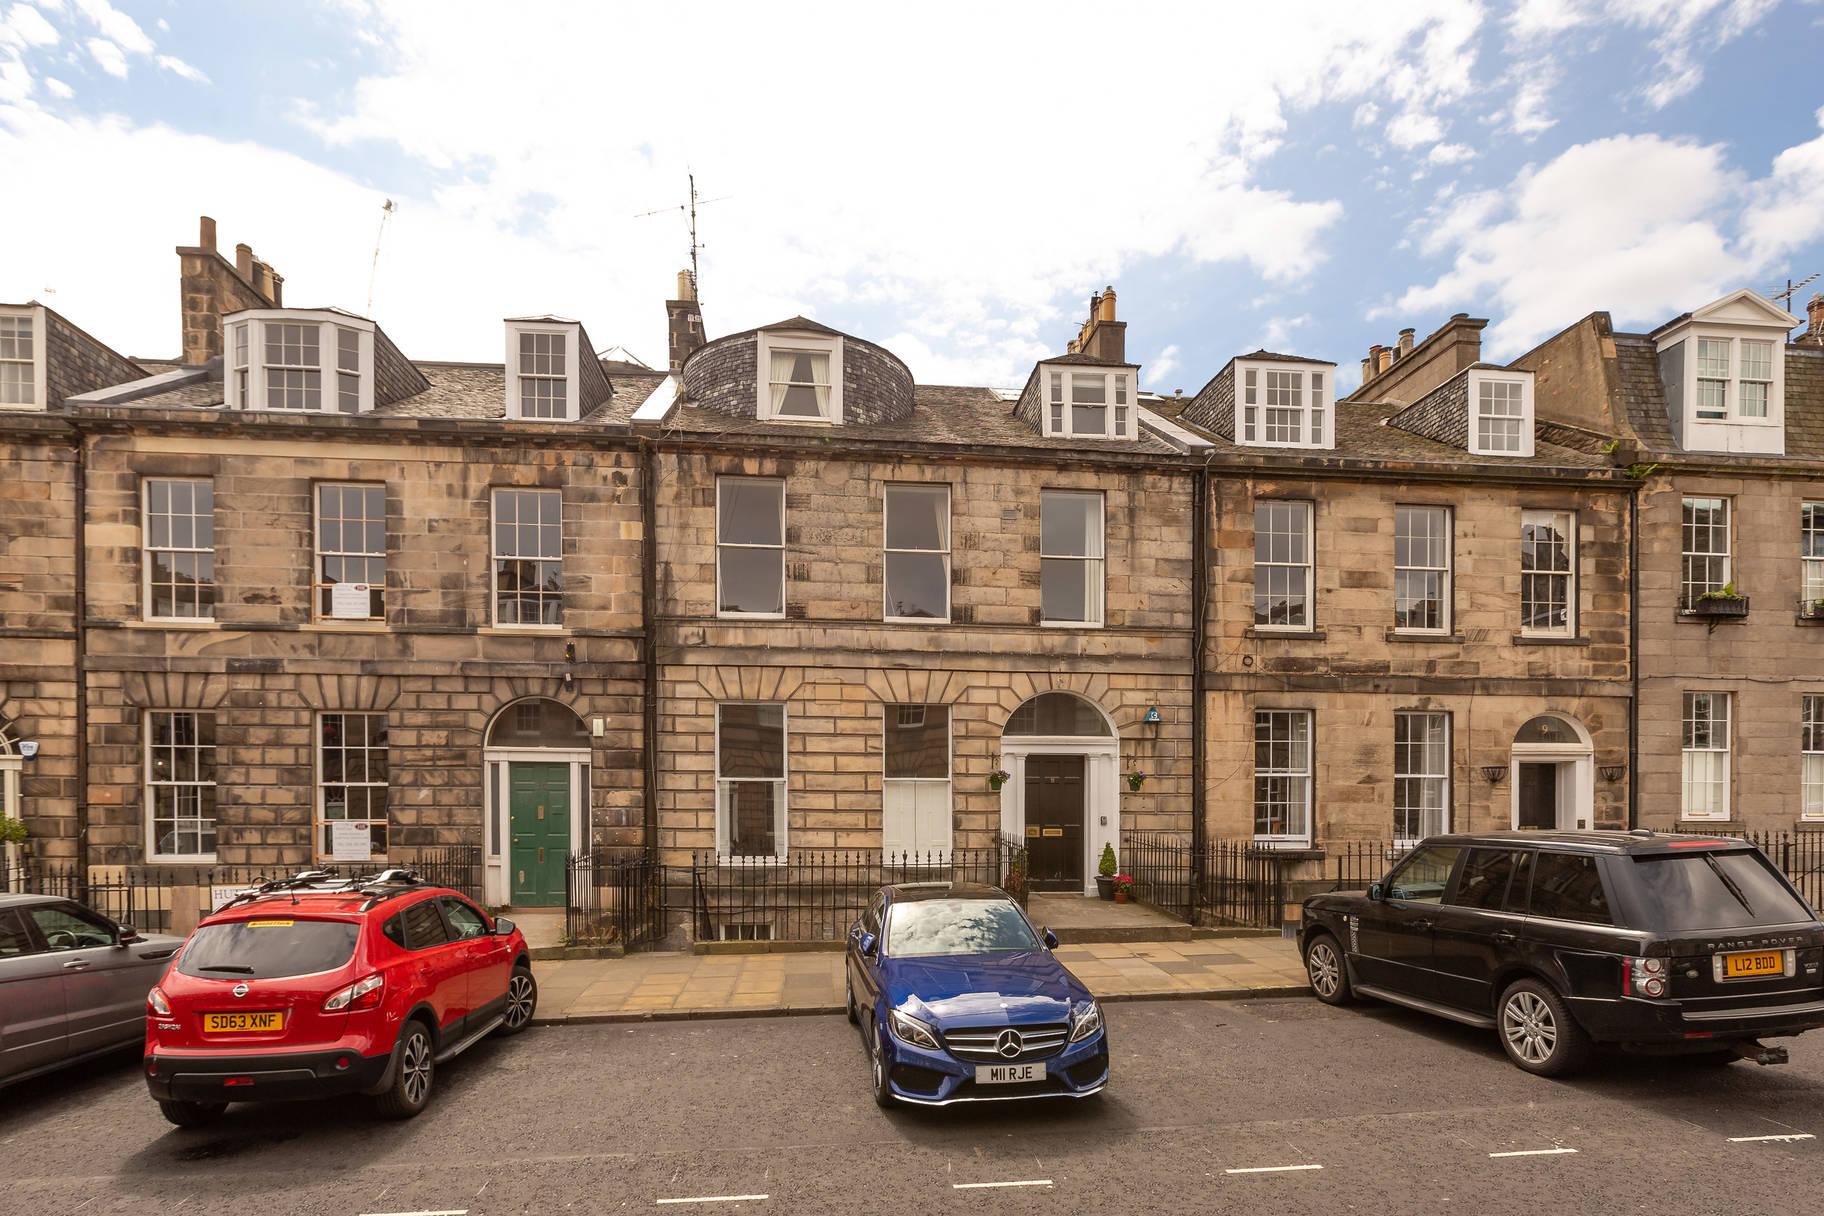 11/1 Albany Street, New Town, Edinburgh, EH1 3PY